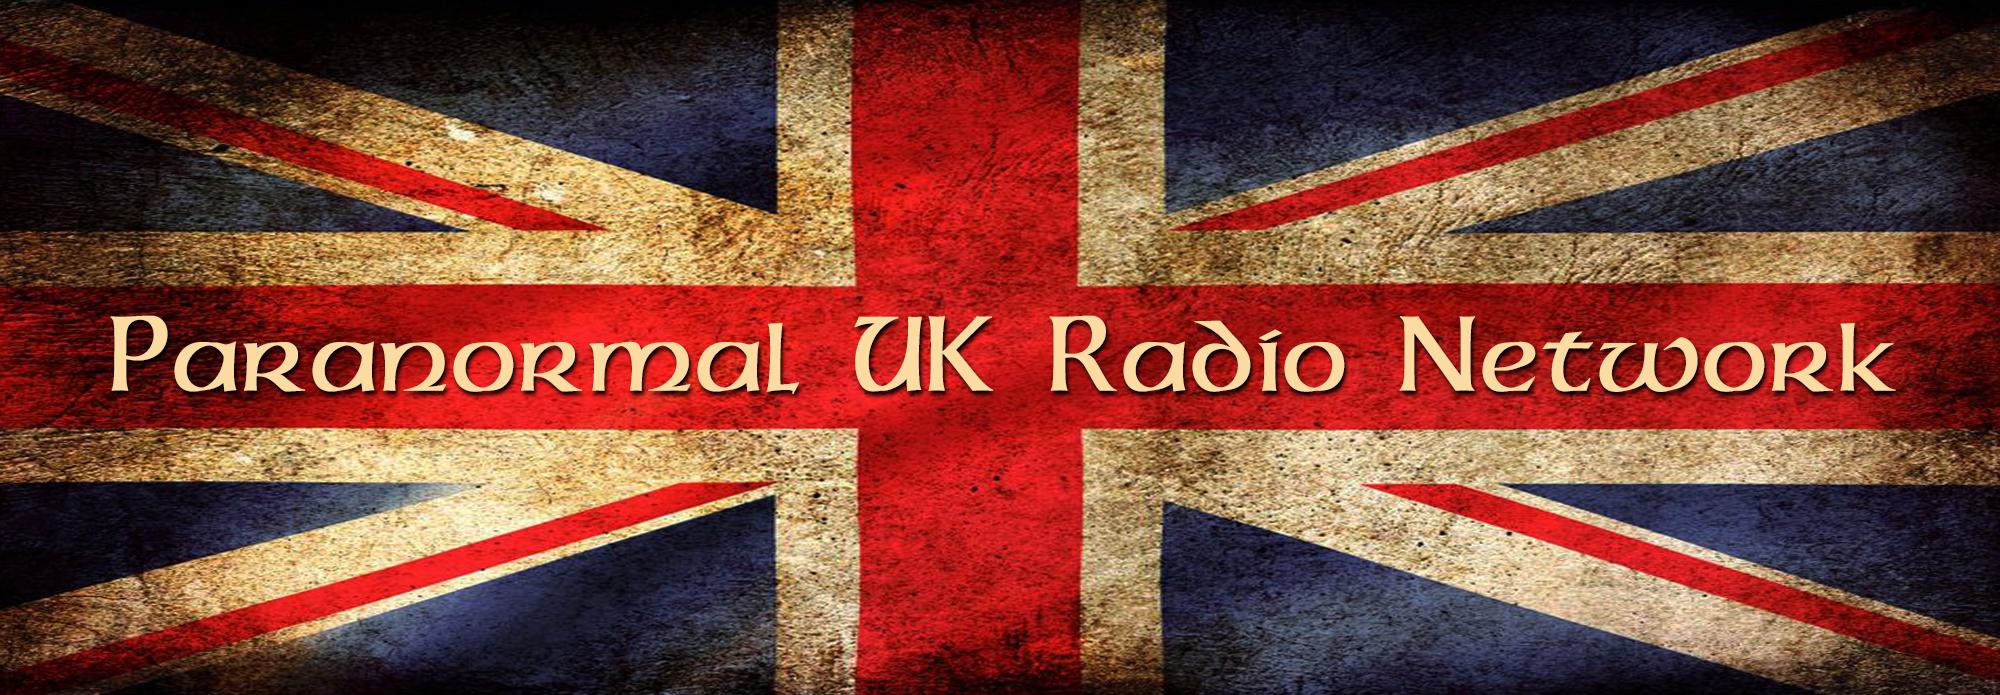 Paranormal UK Radio Network Logo